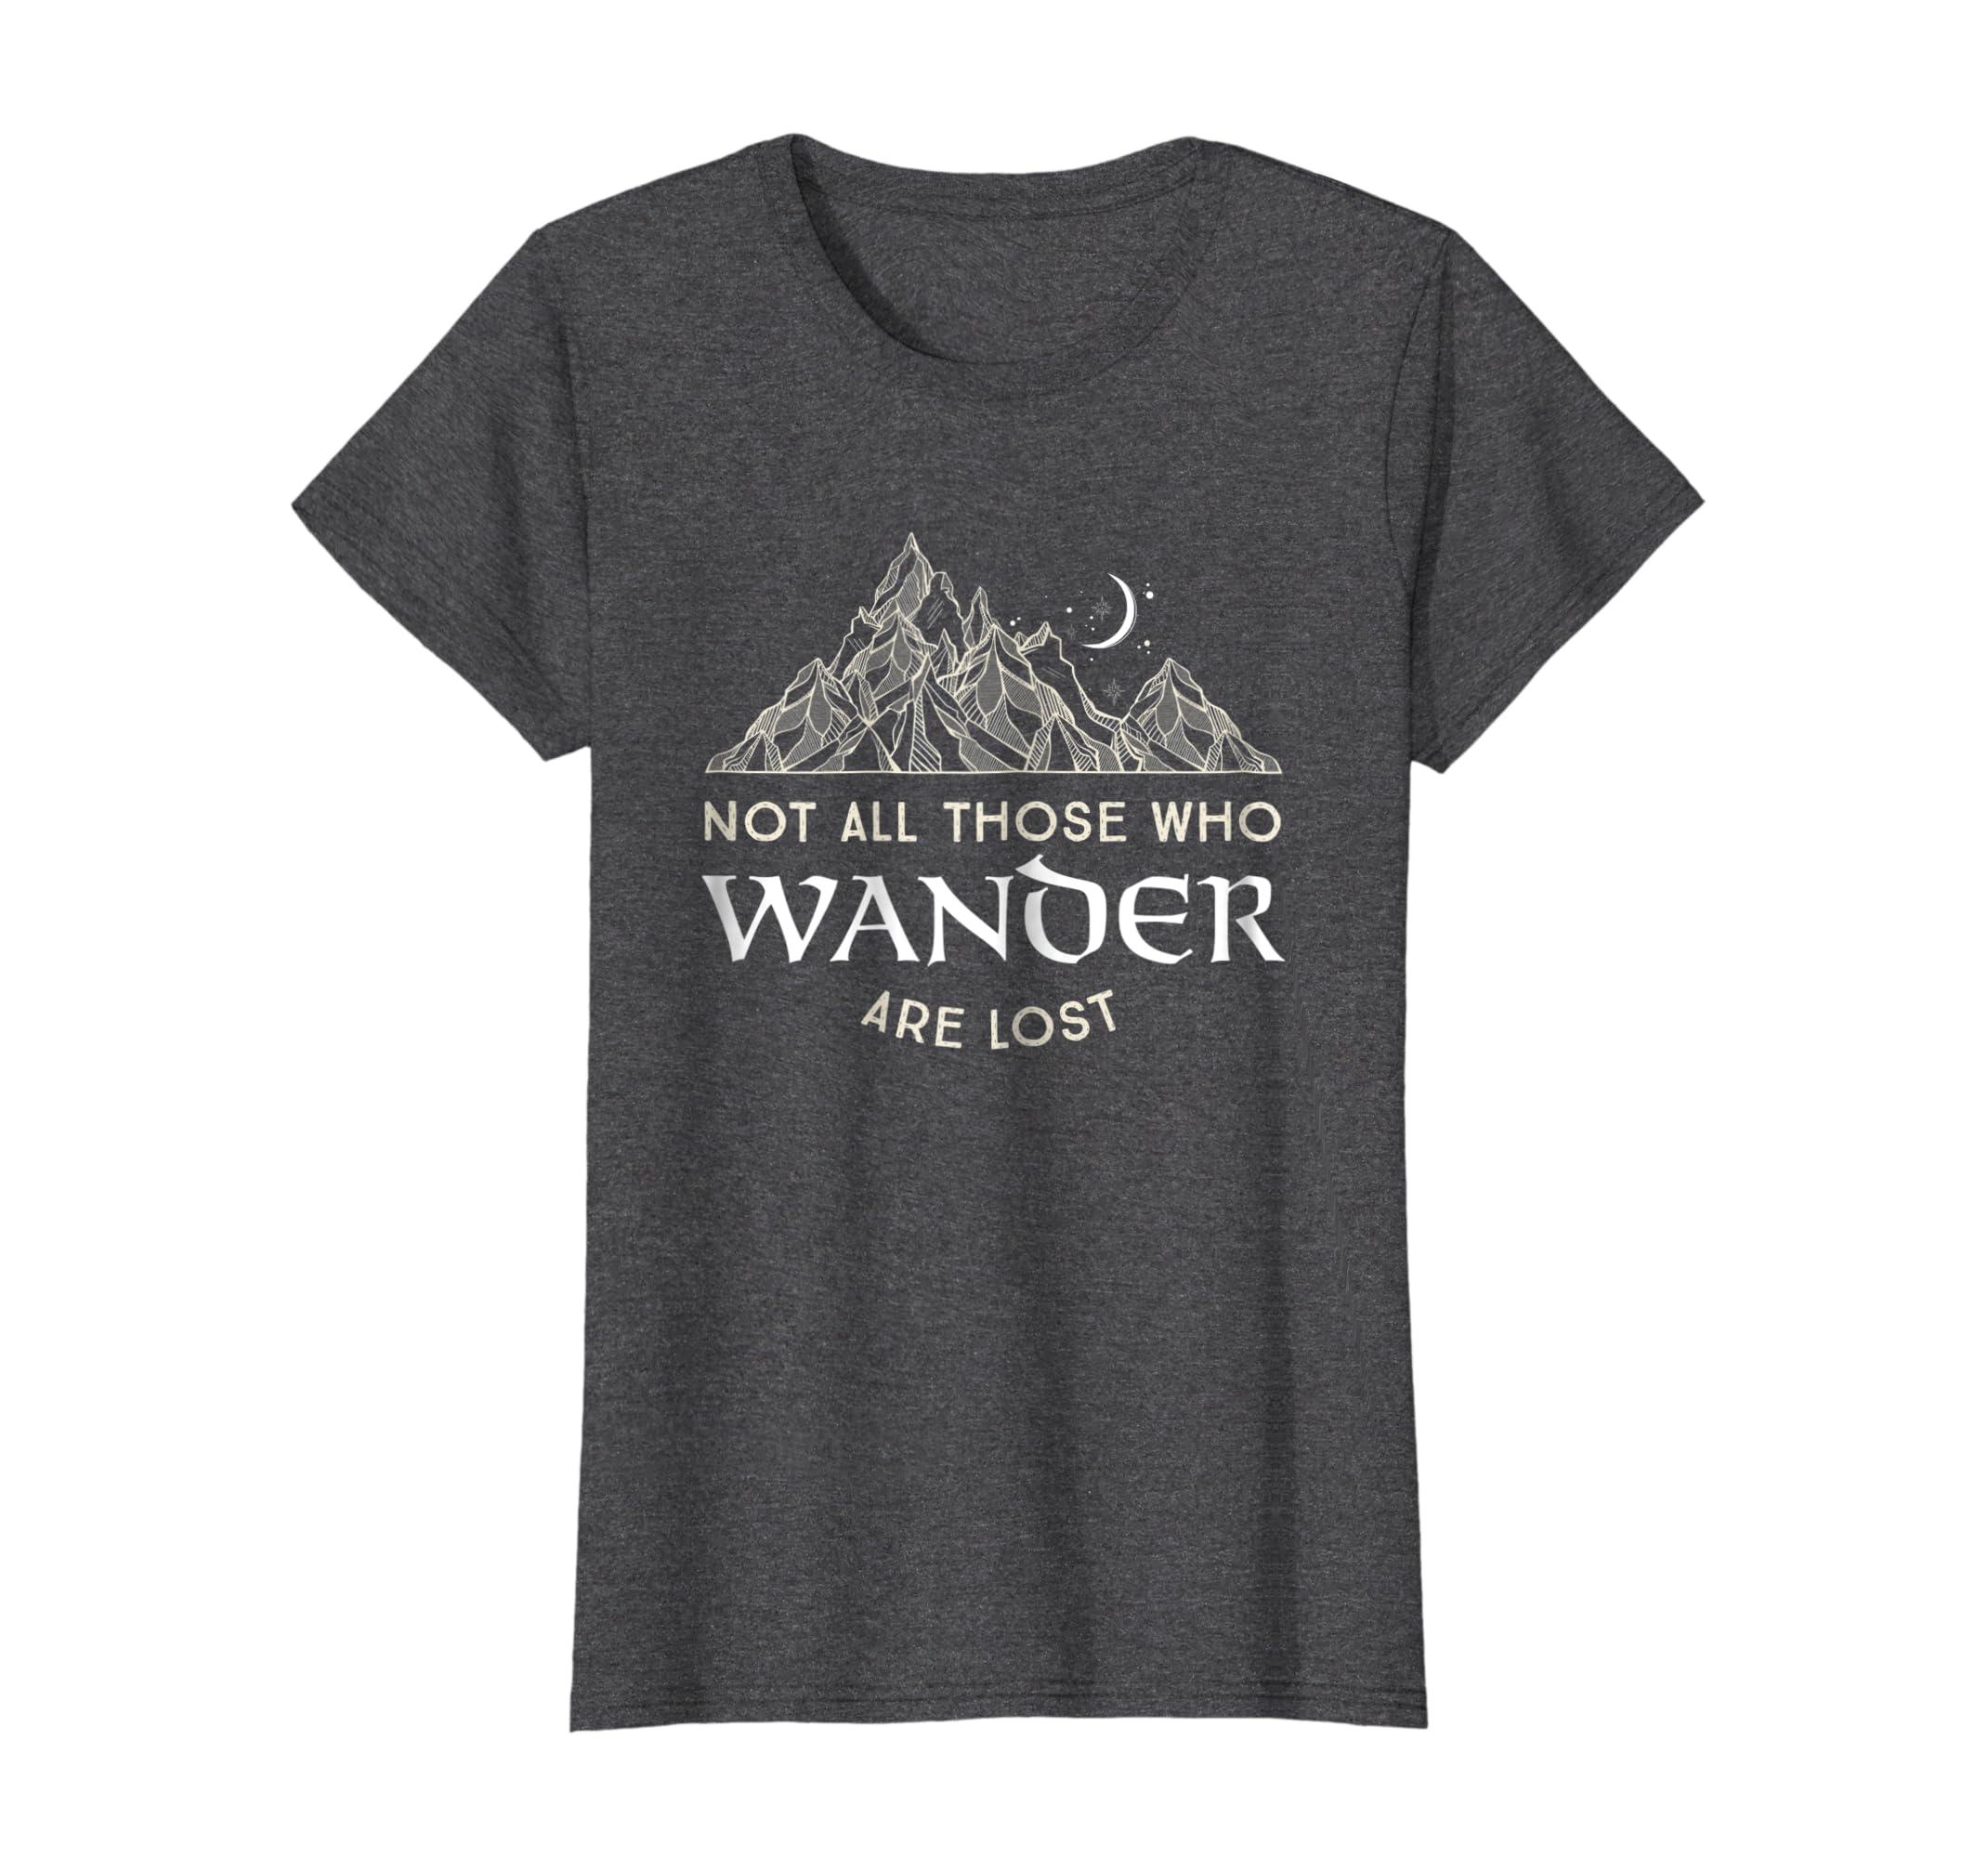 63714e1cc6b Amazon.com  Not All Those Who Wander Are Lost Tshirt  Clothing